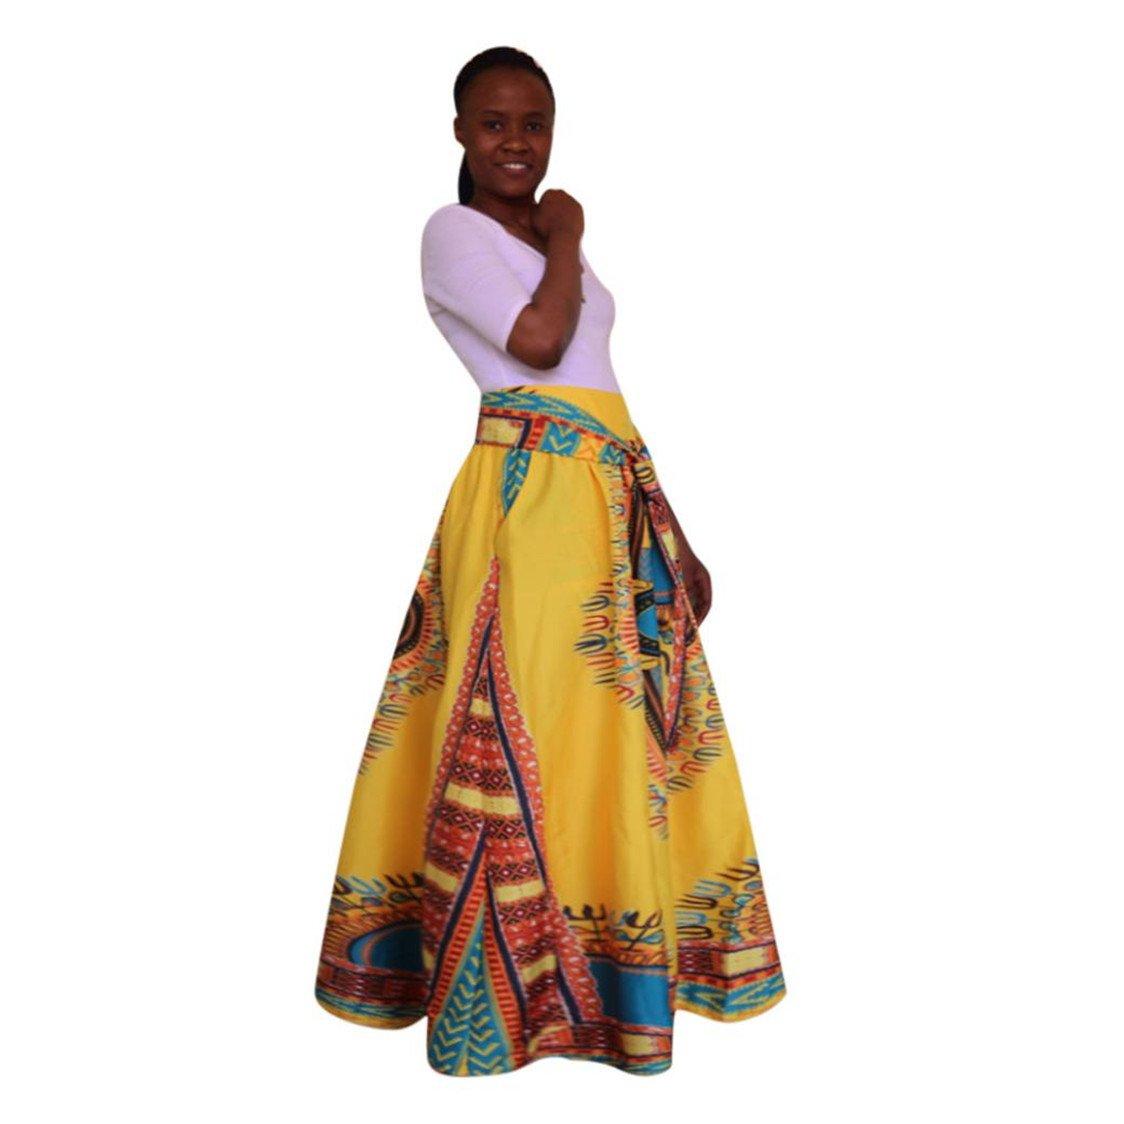 TIFENNY Women's Dashiki Print Chiffon High Waist Party Boho Ankara Maxi African Style Long Skirt with Sashes (XL, Yellow)